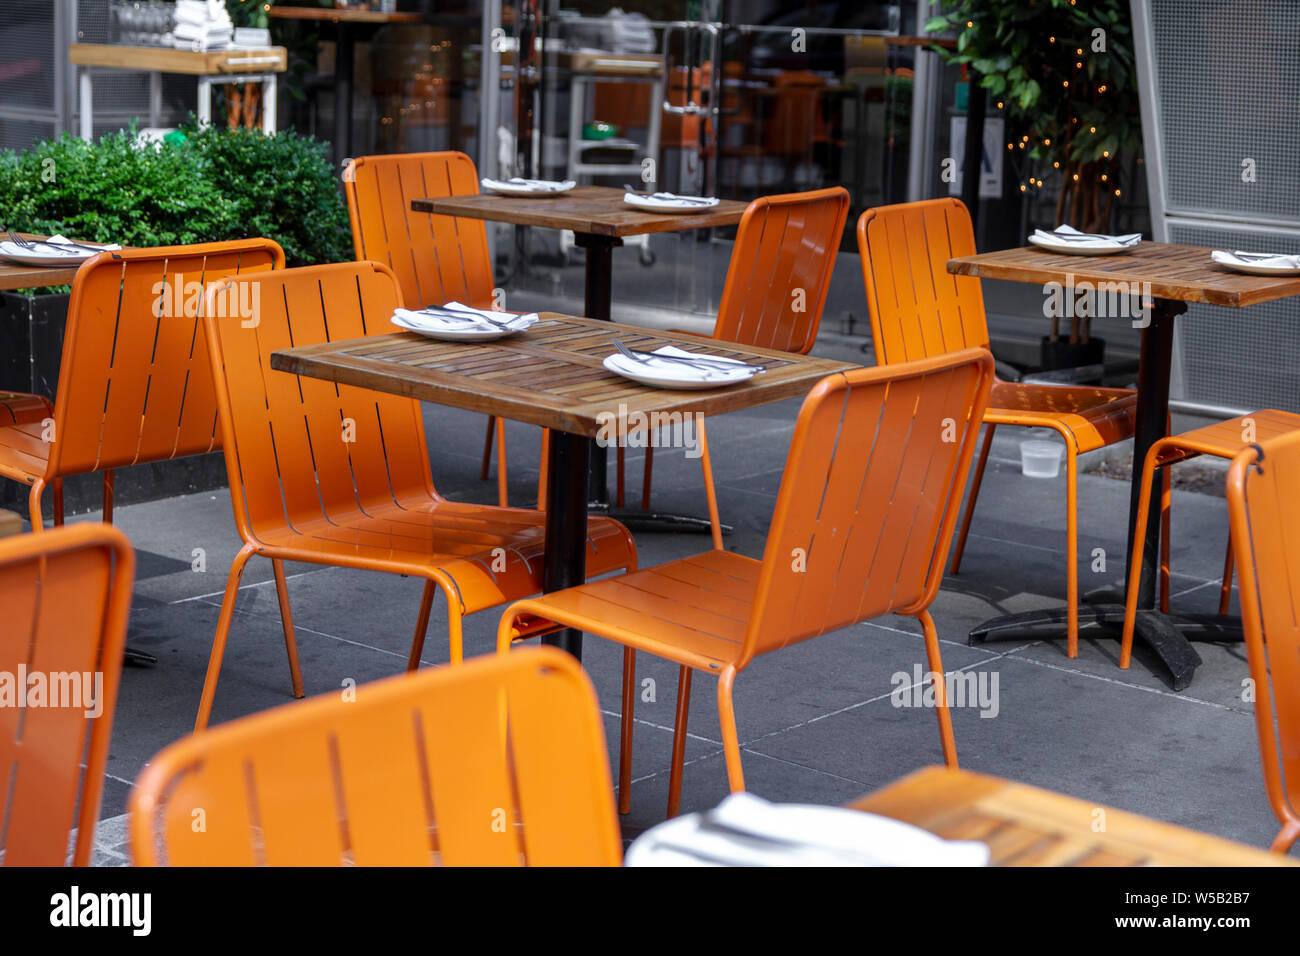 Comedor exterior Foto & Imagen De Stock: 261472155 - Alamy